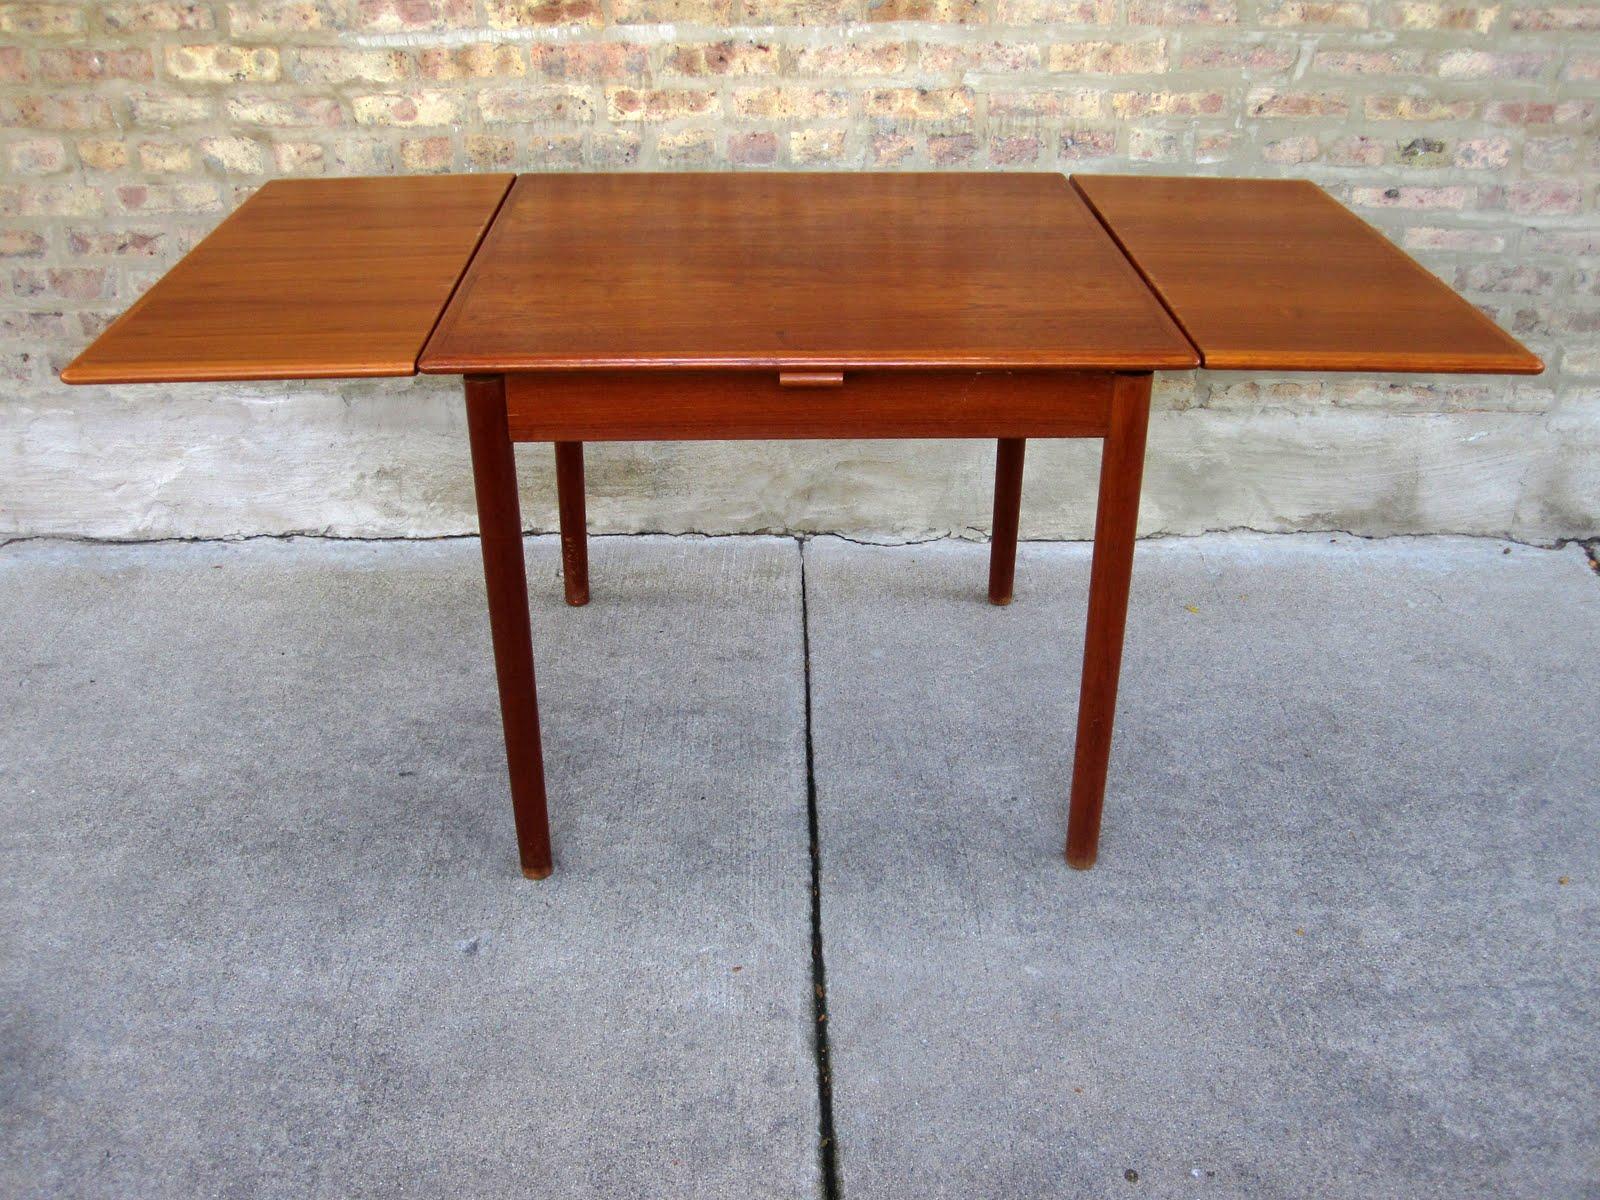 circa midcentury 39 danish modern 39 teak dining table - Scandinavian Teak Dining Room Furniture